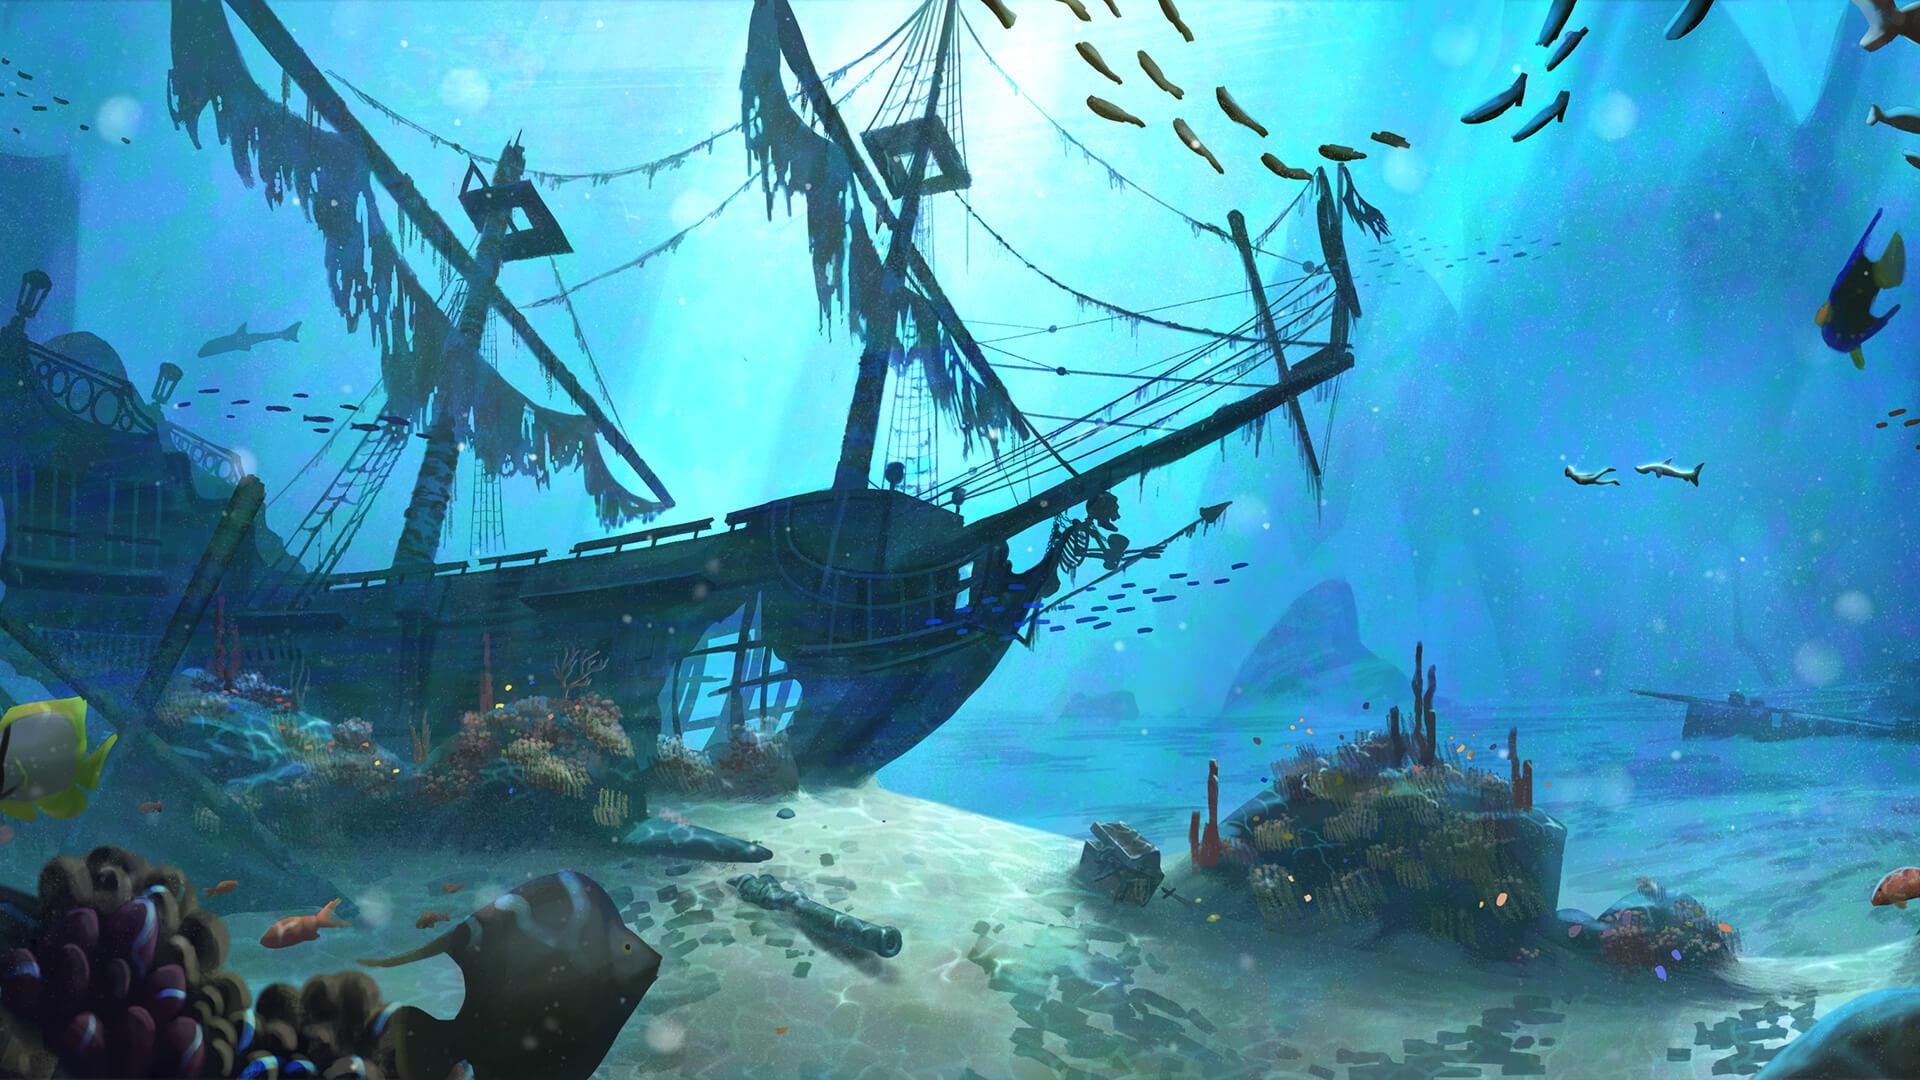 Atlantis Renaissance Underwater_boat_by_dapuffster-dch10p1